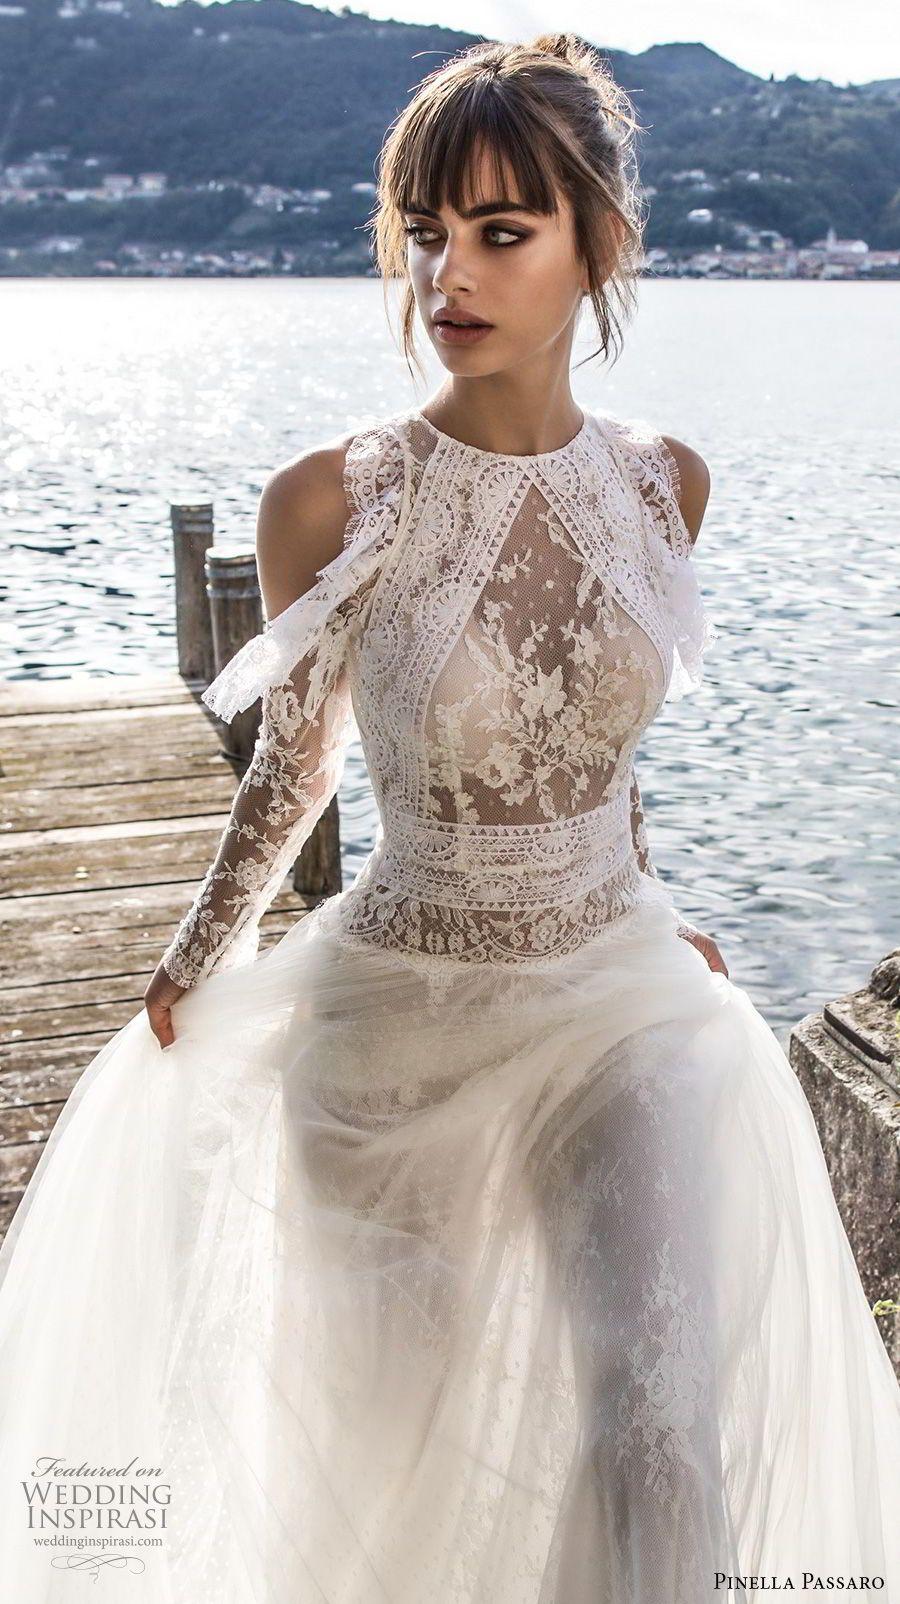 Pinella passaro wedding dresses moda pinterest wedding